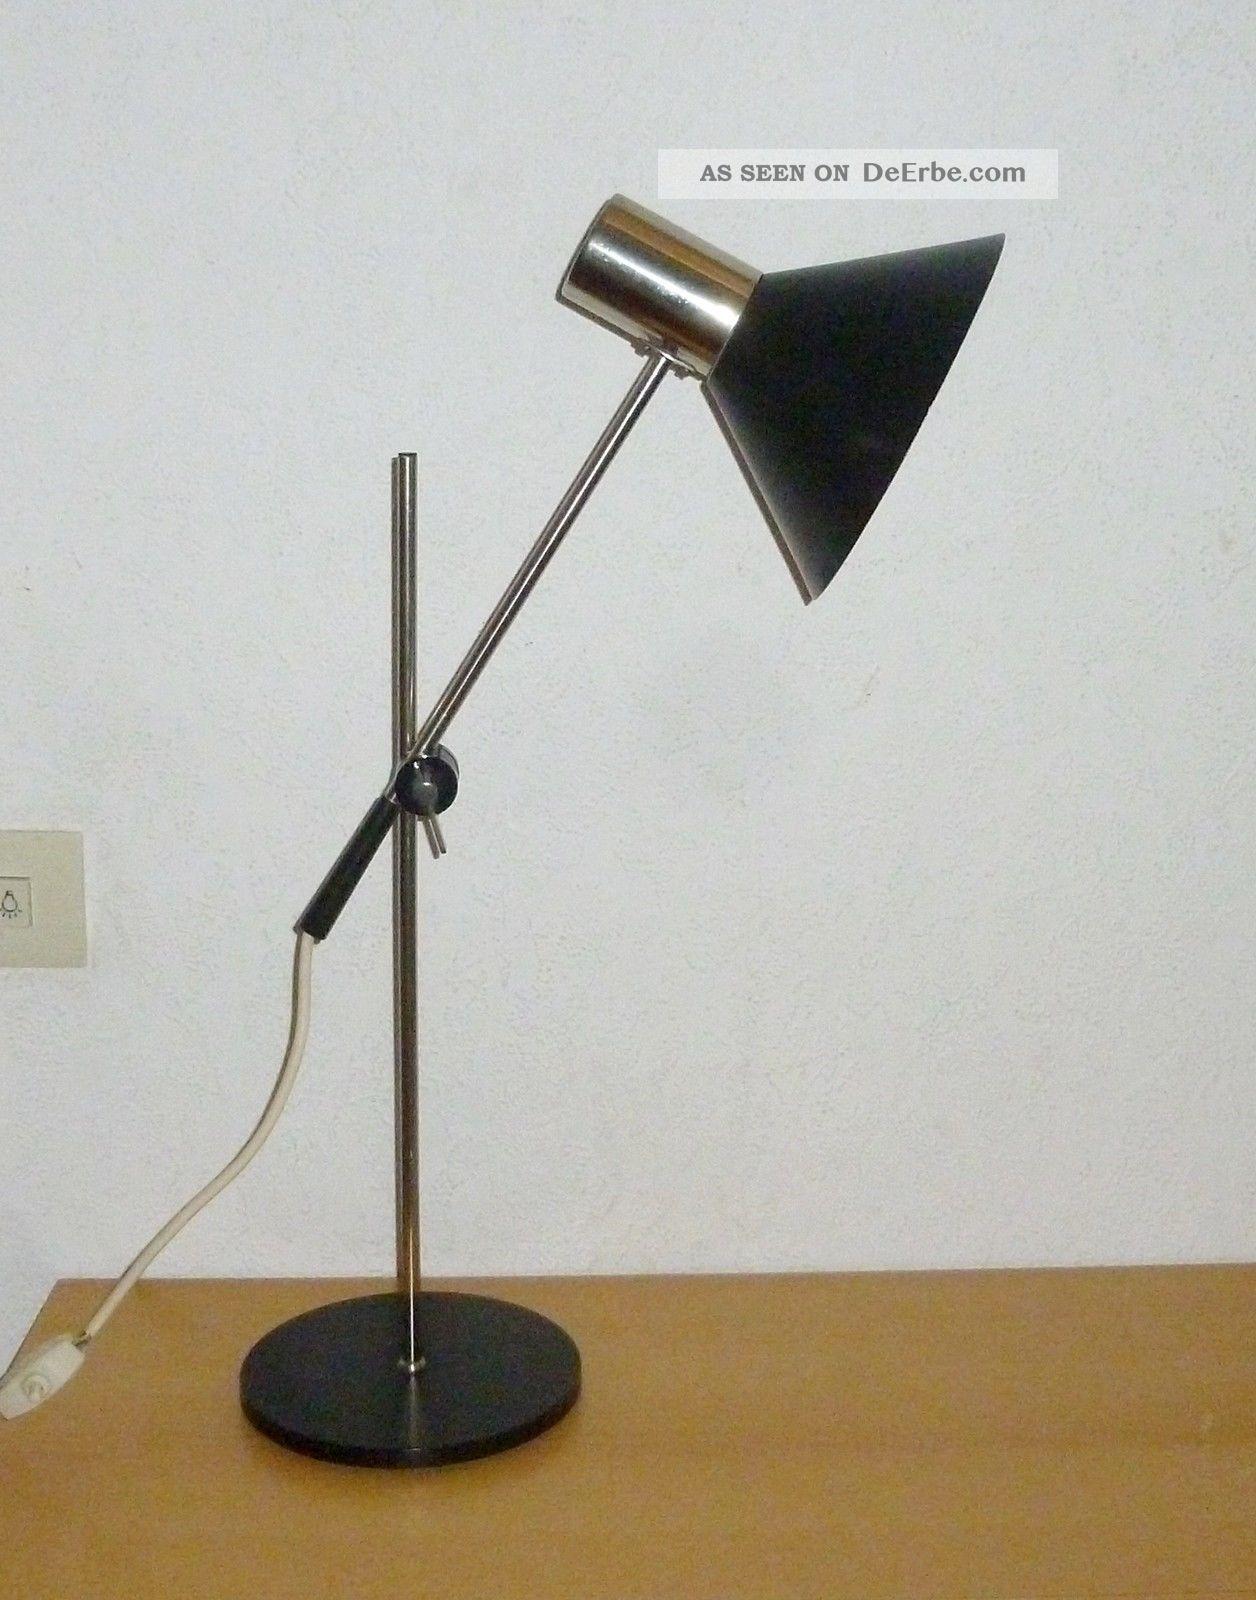 50er 60er Jahre Stehlampe Tischlampe Staff Lampe Spot Lamp Chrom